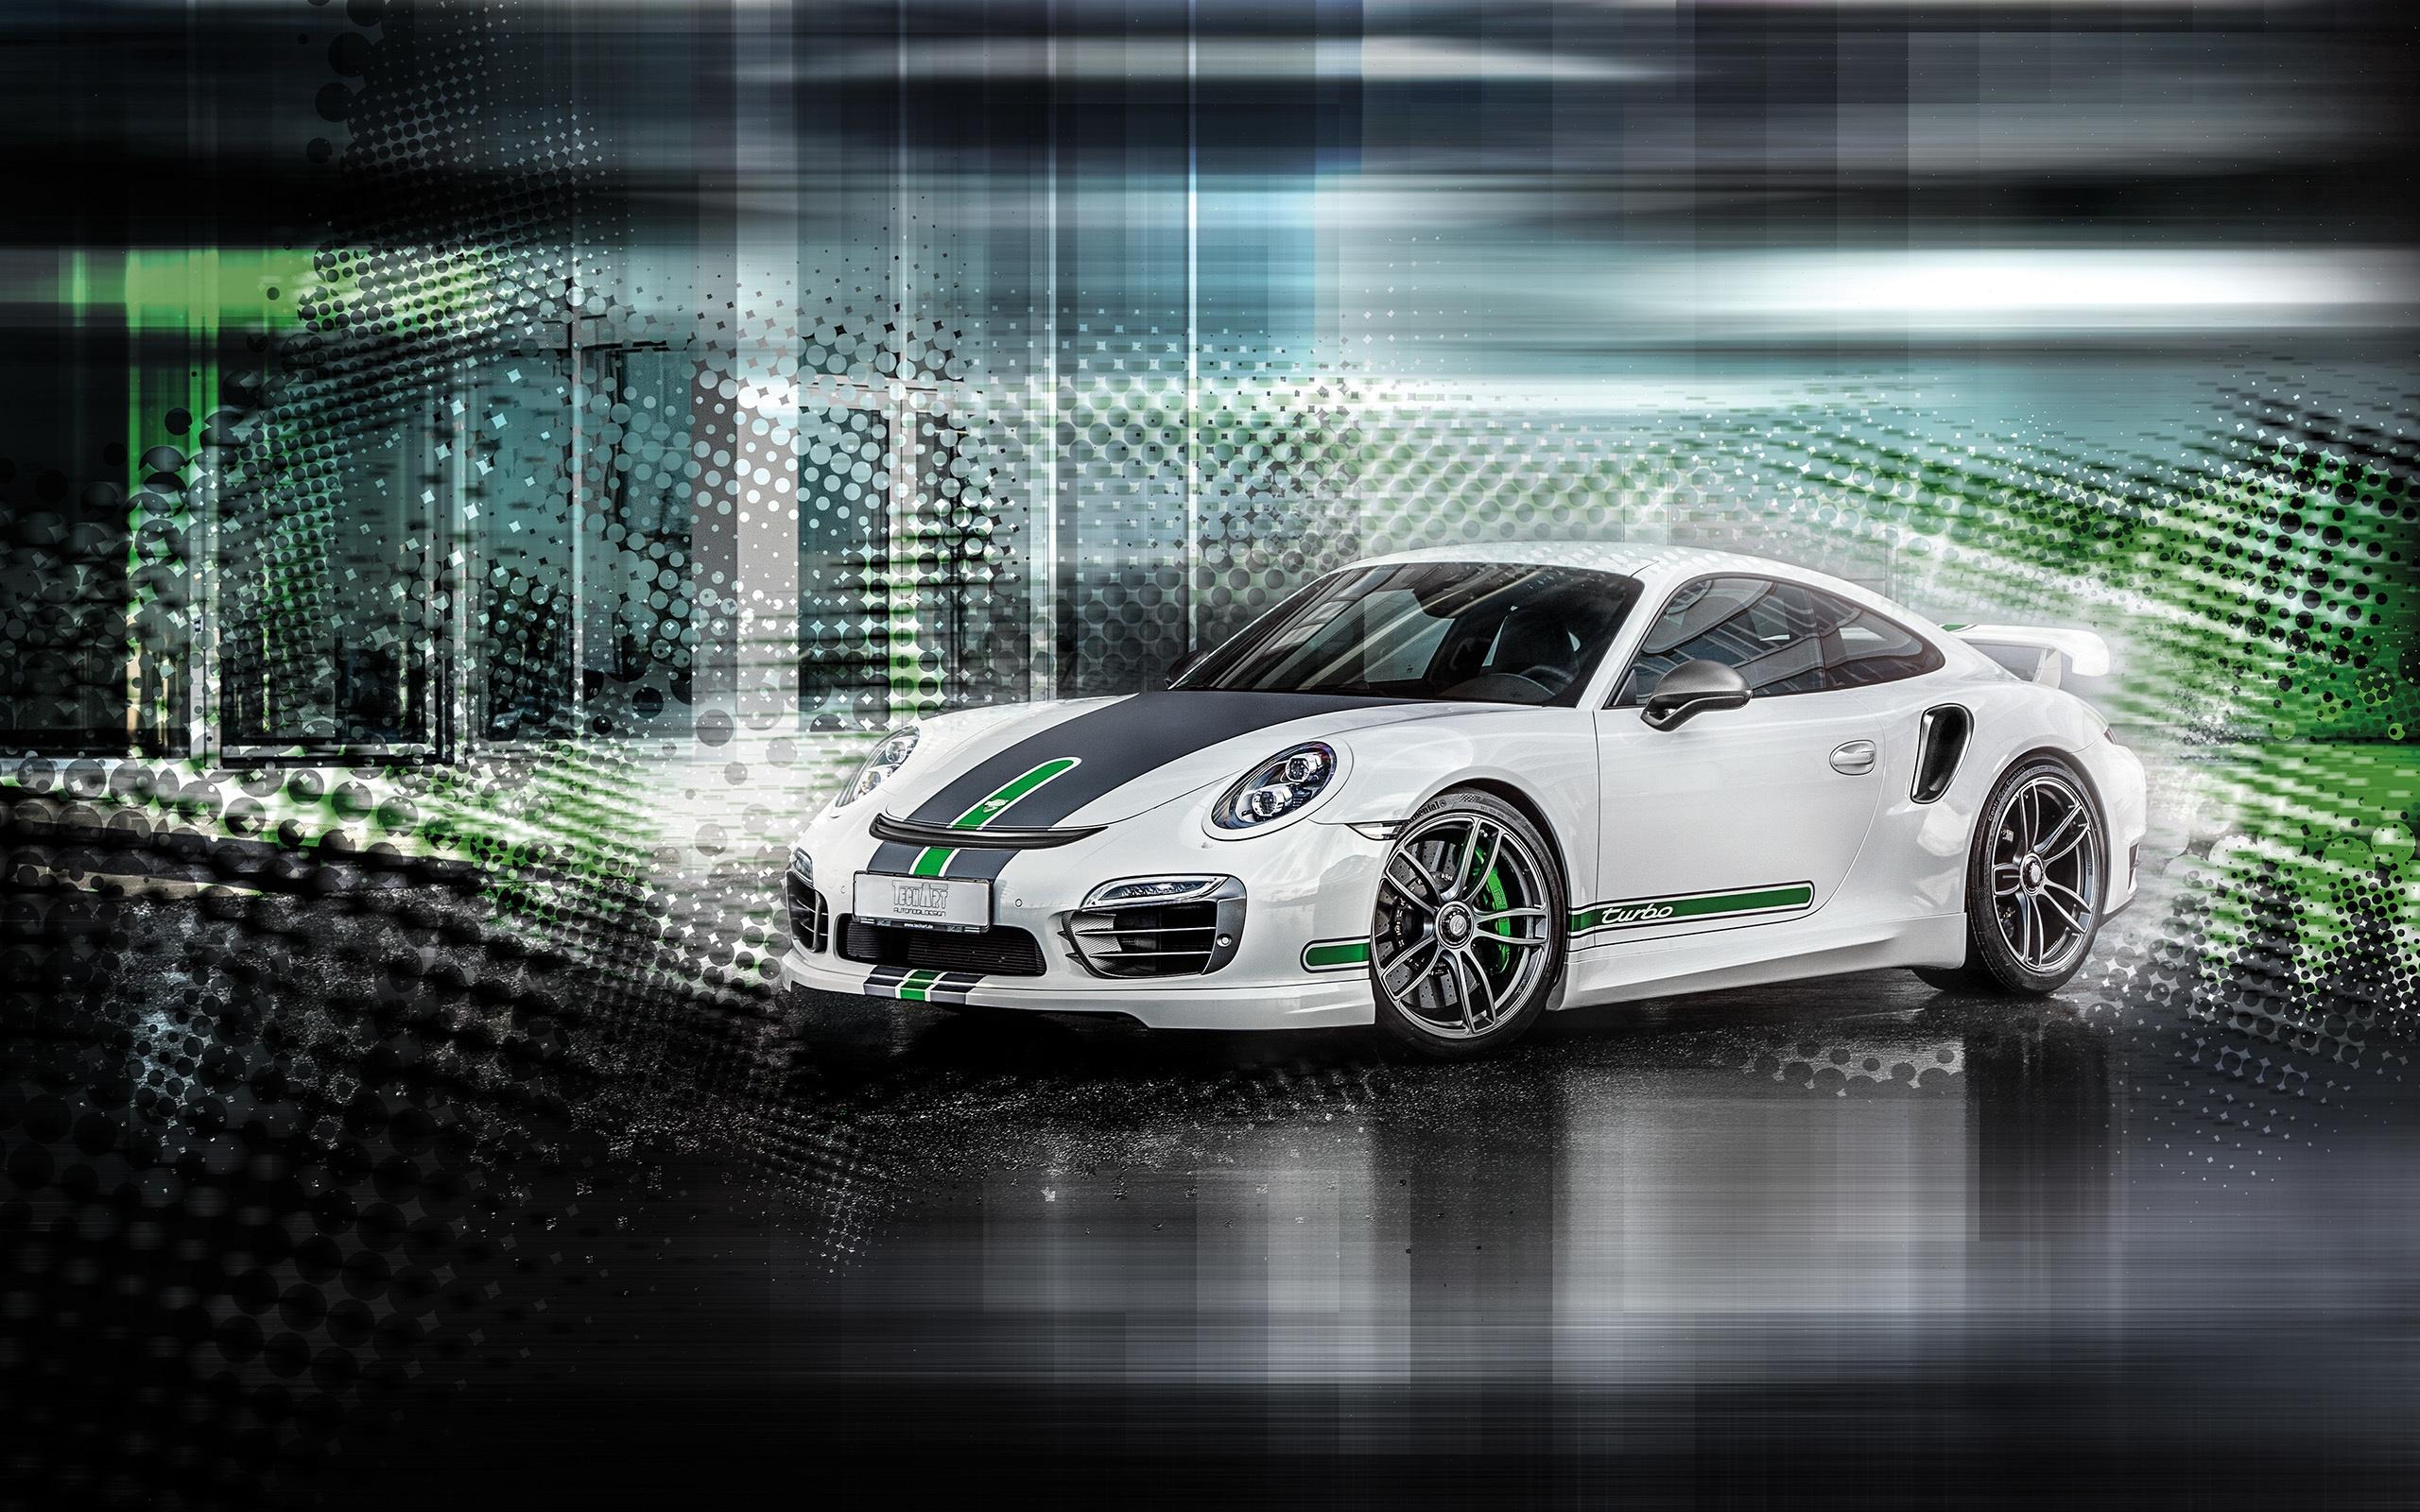 TechArt Porsche Turbo Wallpapers in jpg format for free